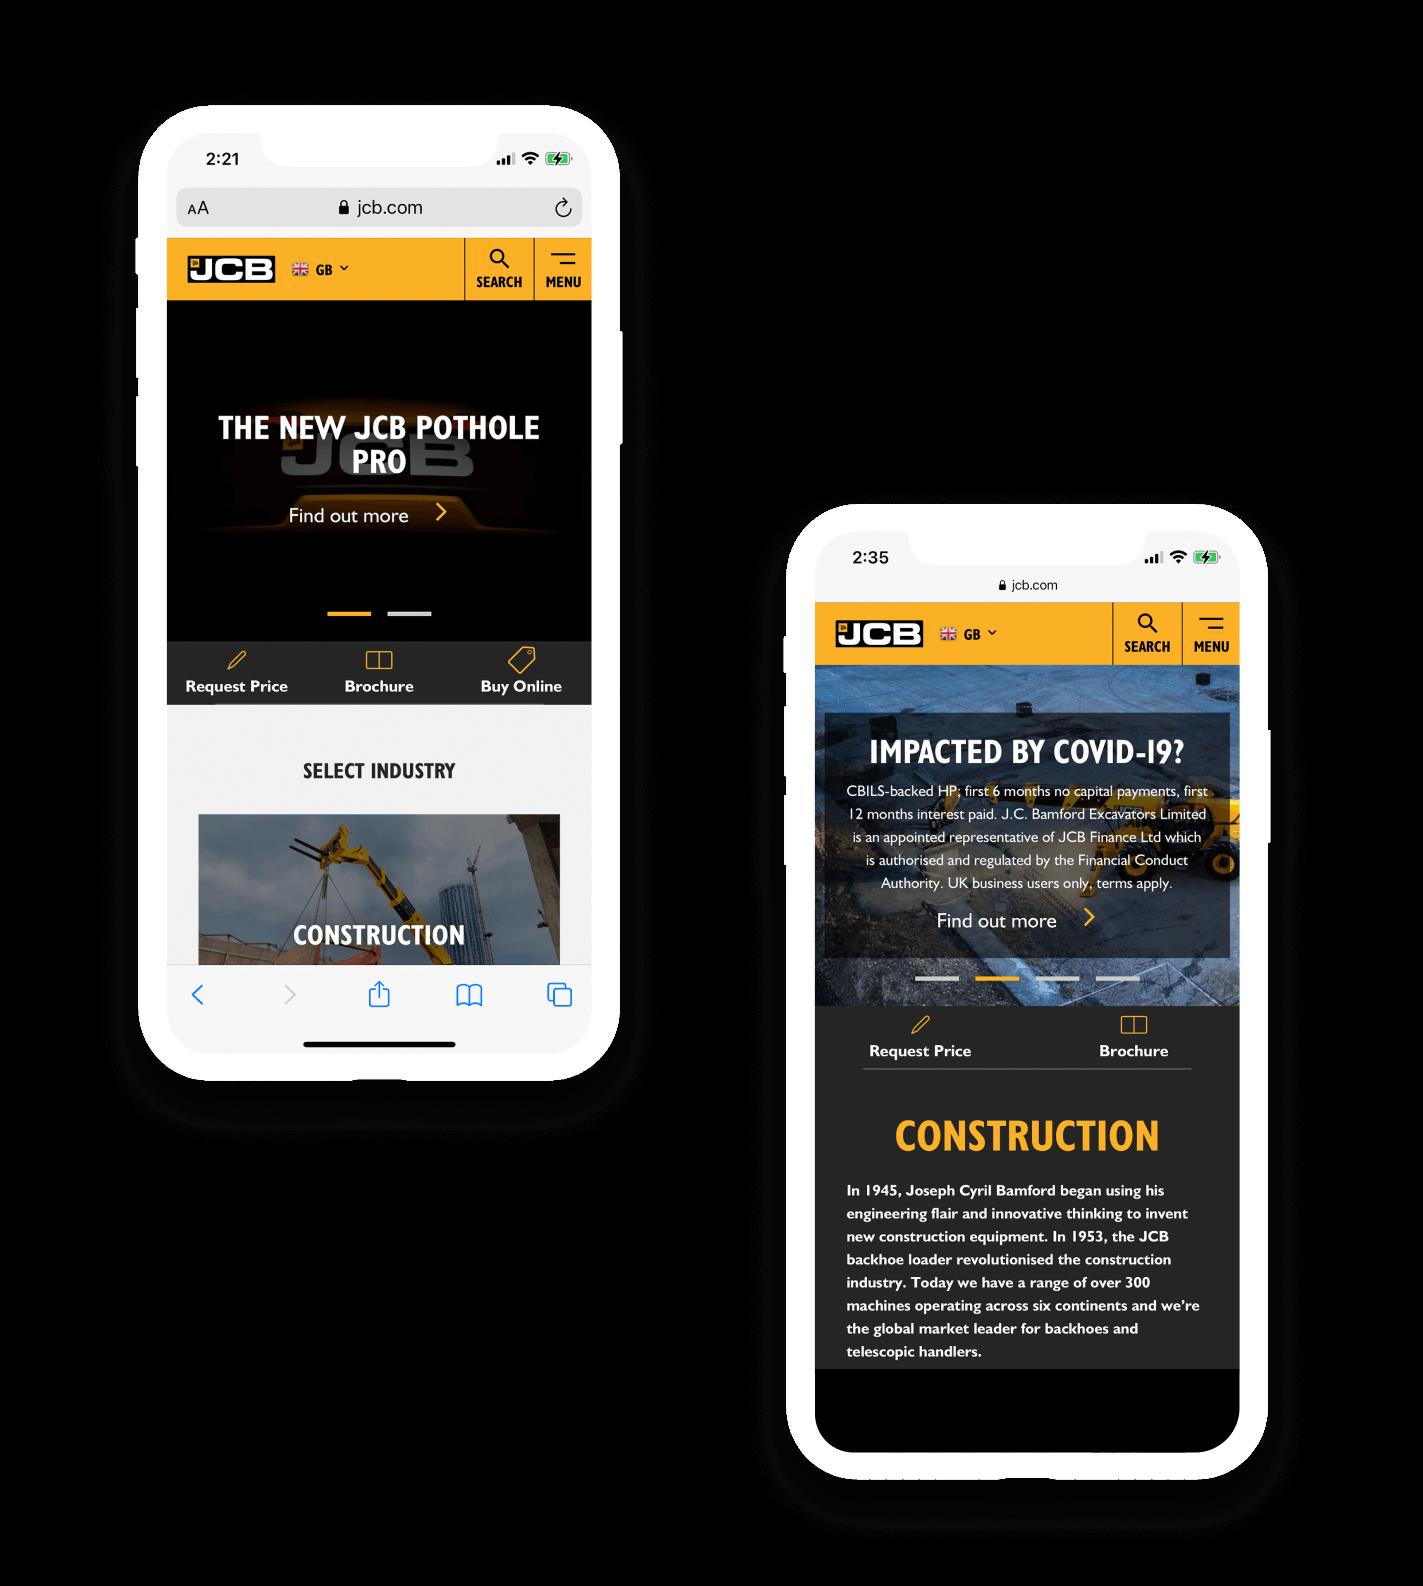 JCB website design